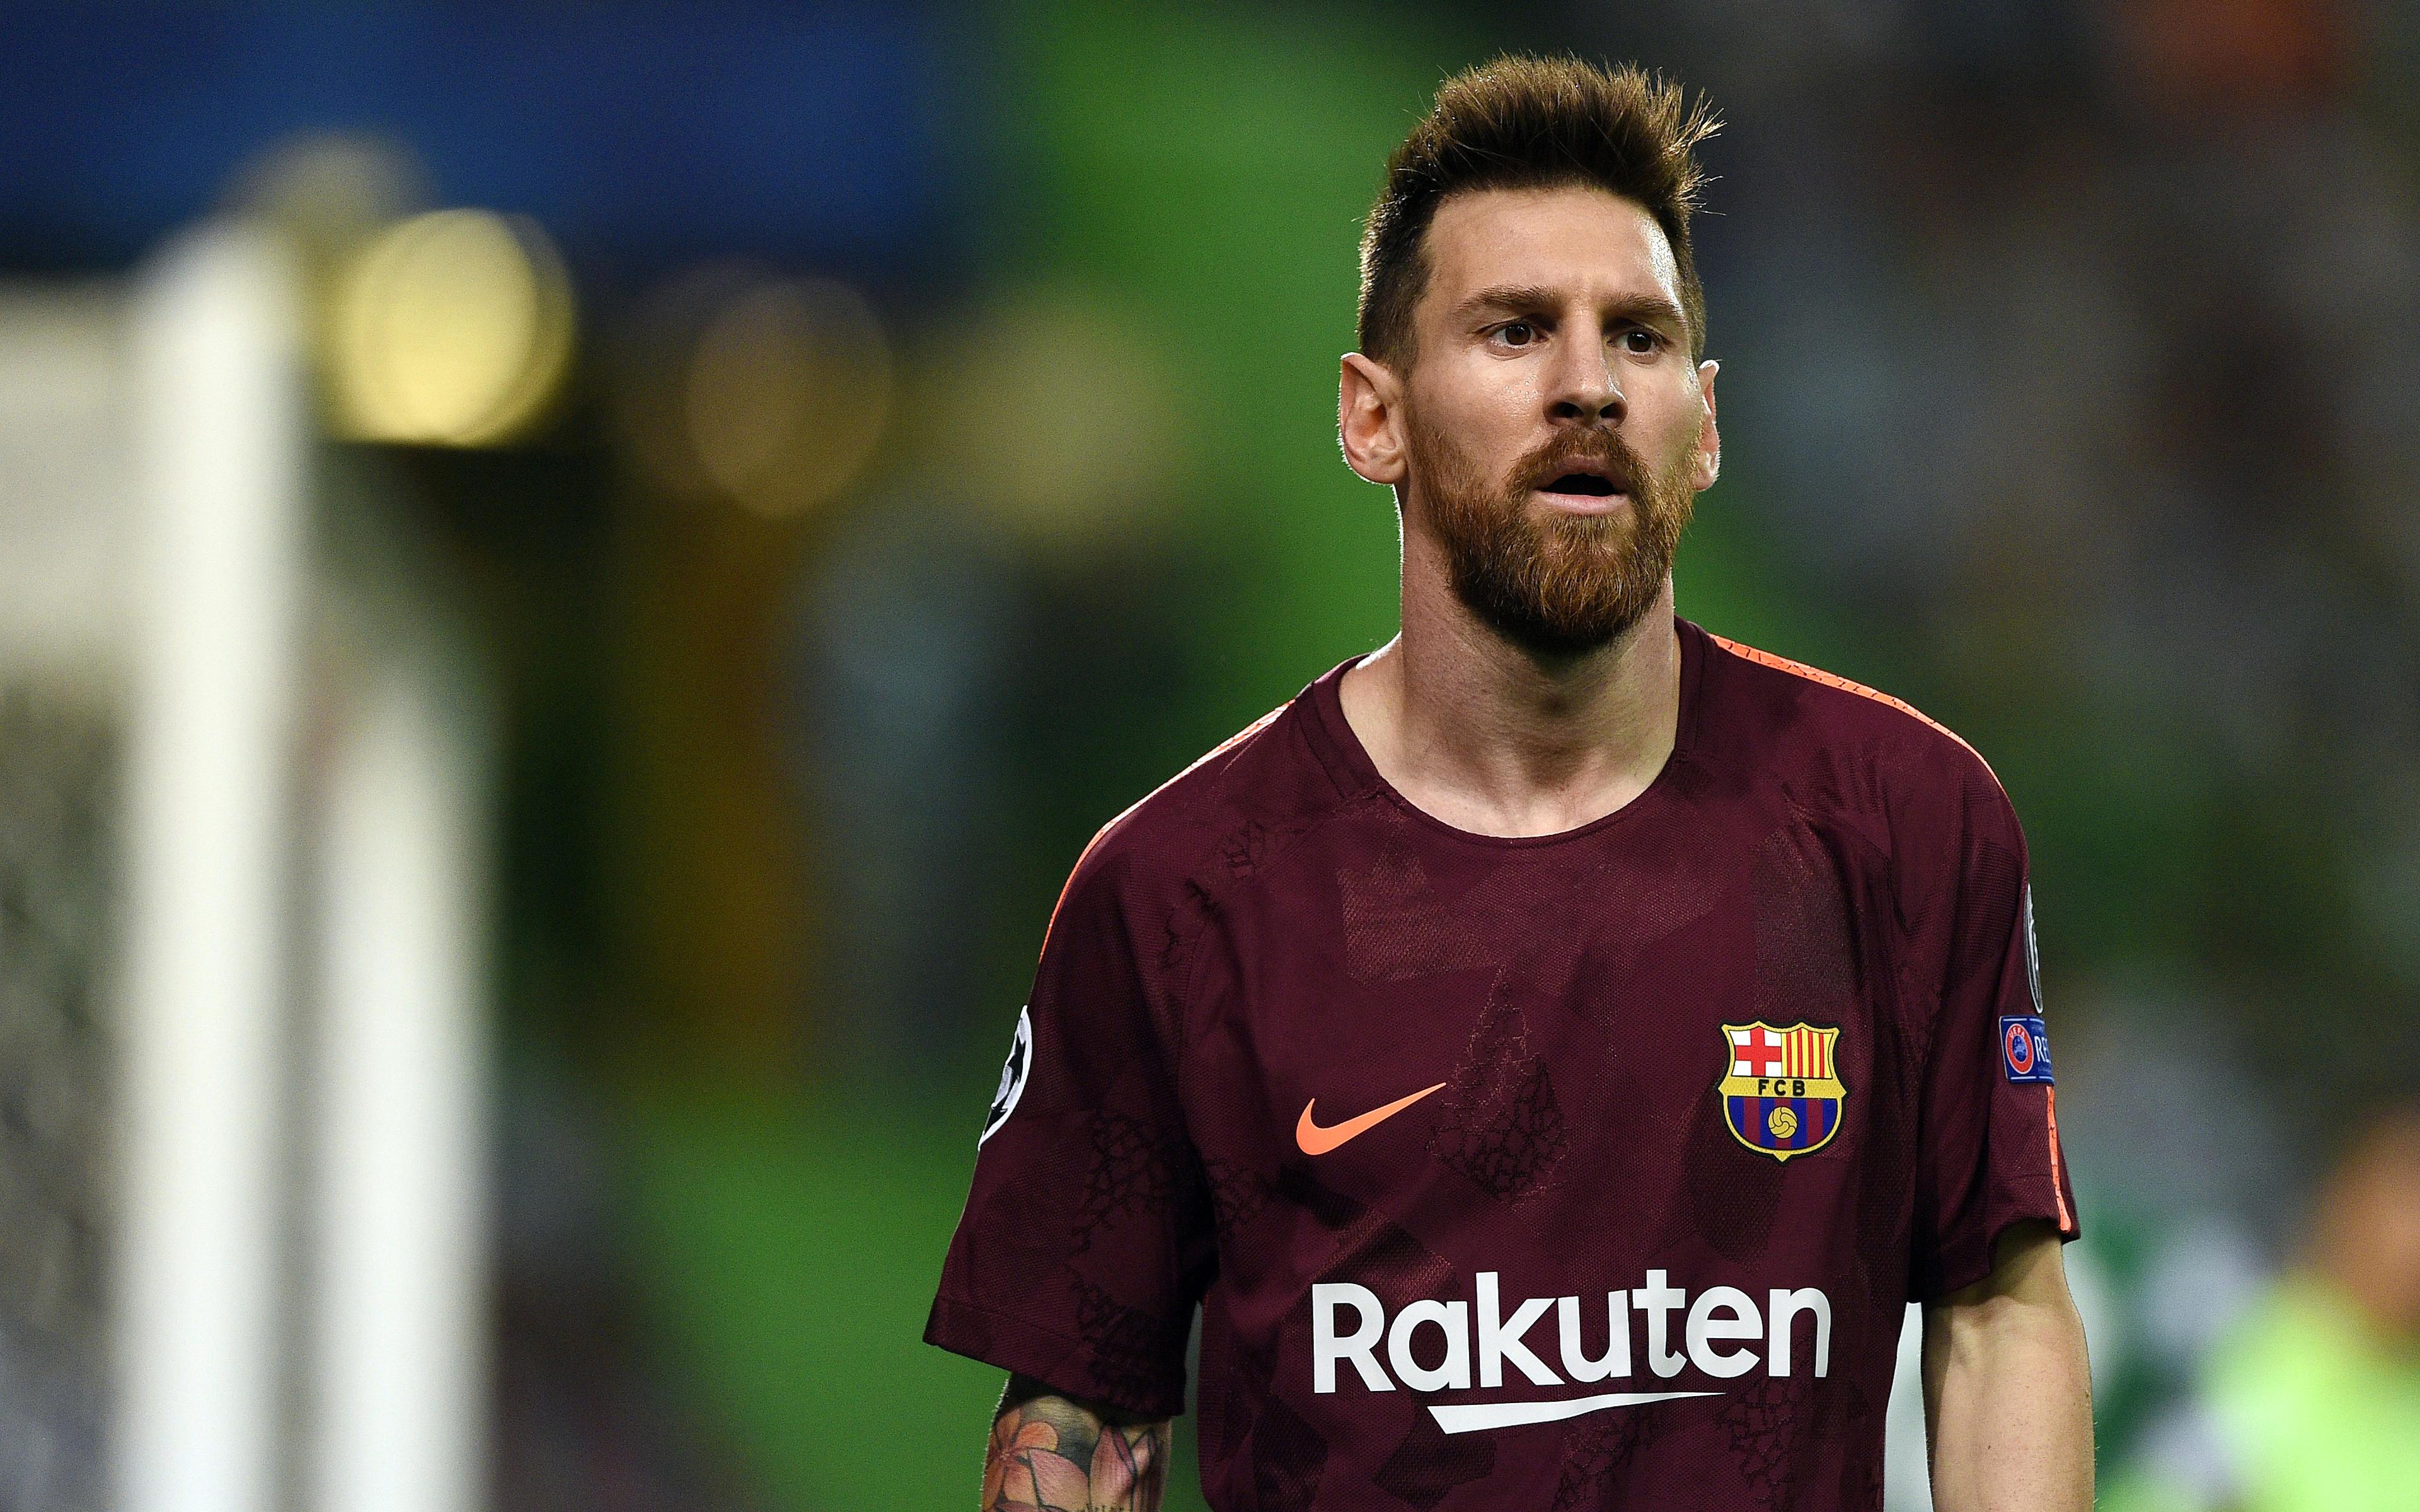 4k, Messi, 2017, Football Stars, Barca, Lionel Messi, - Messi 2017 , HD Wallpaper & Backgrounds